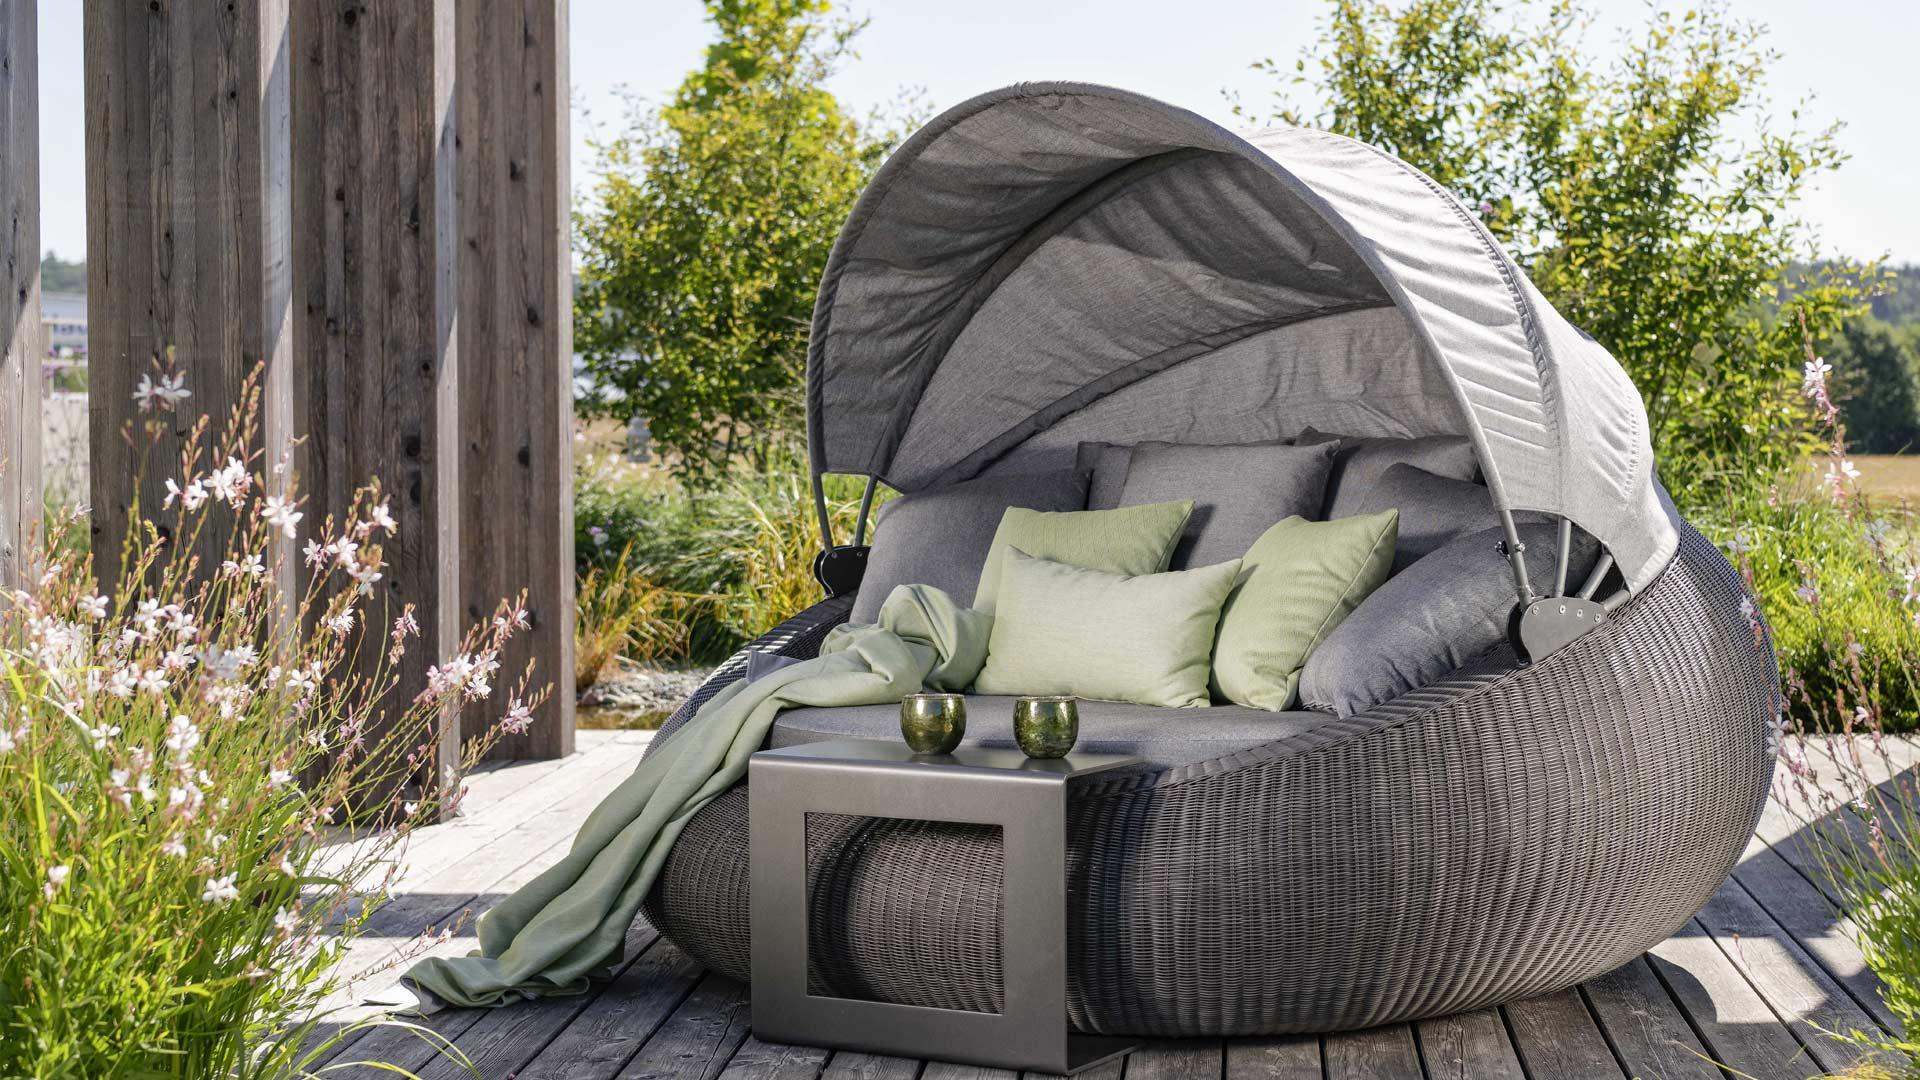 stern gartenm bel in t nisvorst nahe im raum krefeld m nchengladbach kempen m bel klauth. Black Bedroom Furniture Sets. Home Design Ideas